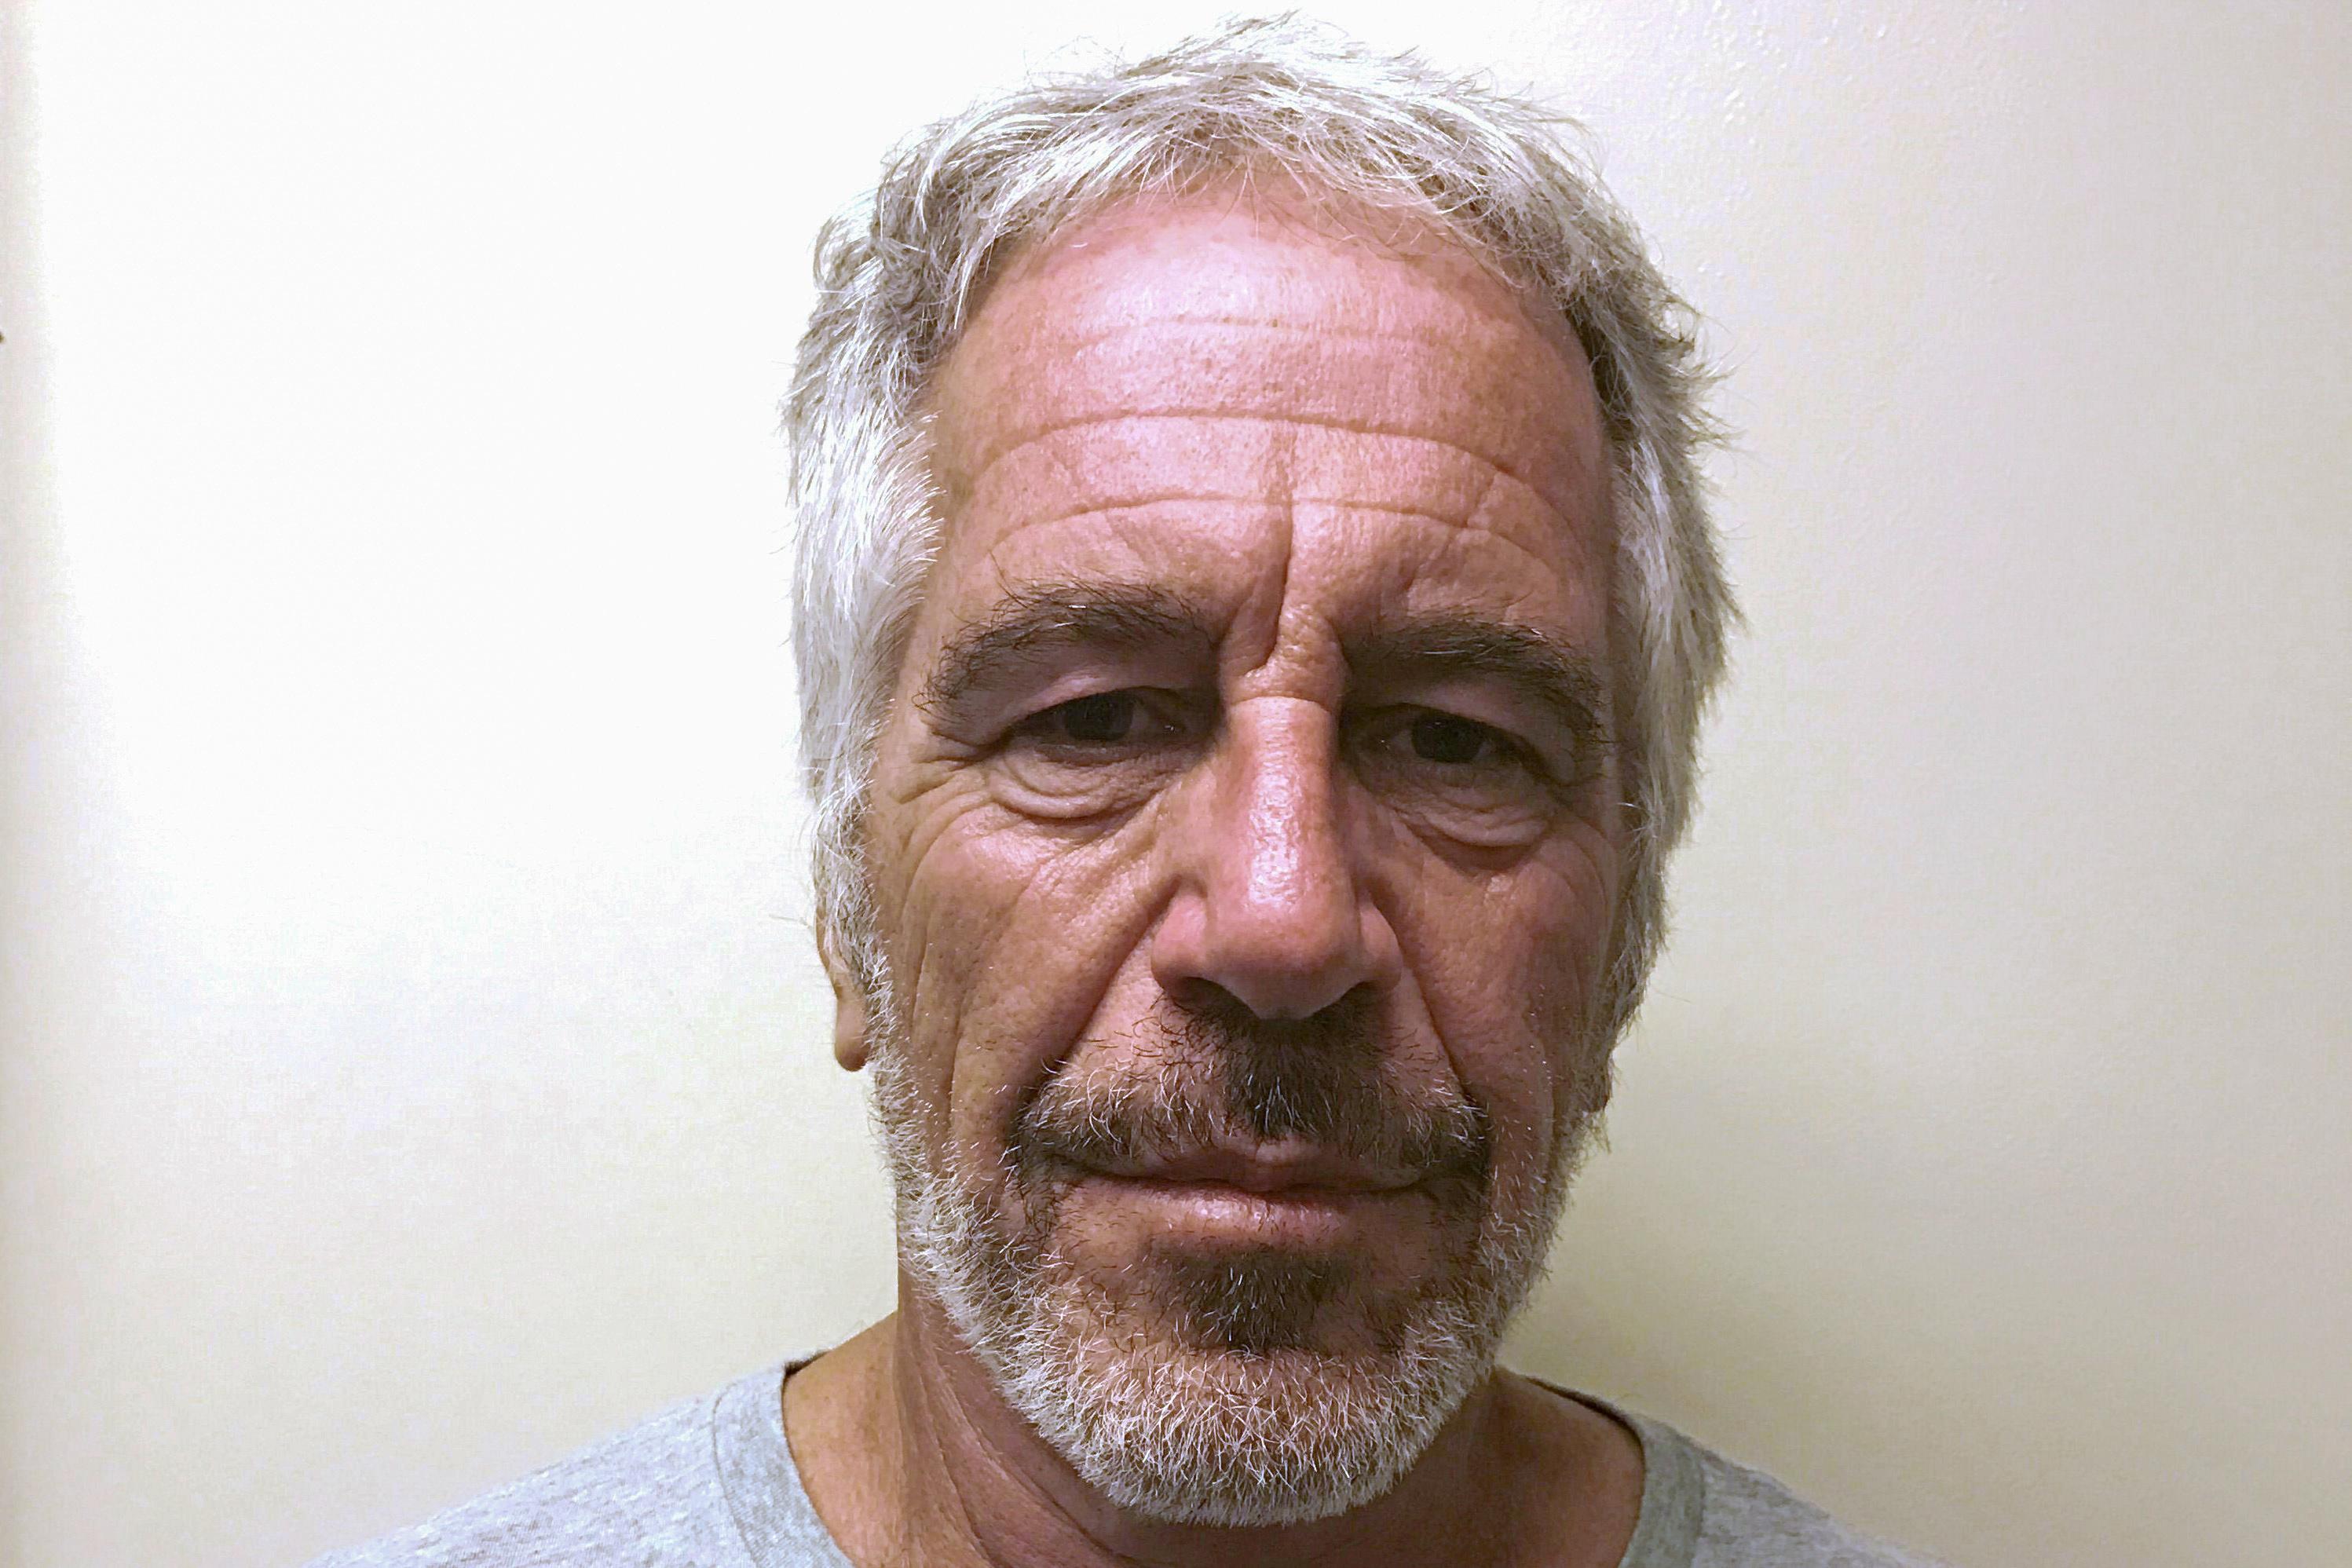 Three more women sue Epstein's estate over alleged abuse